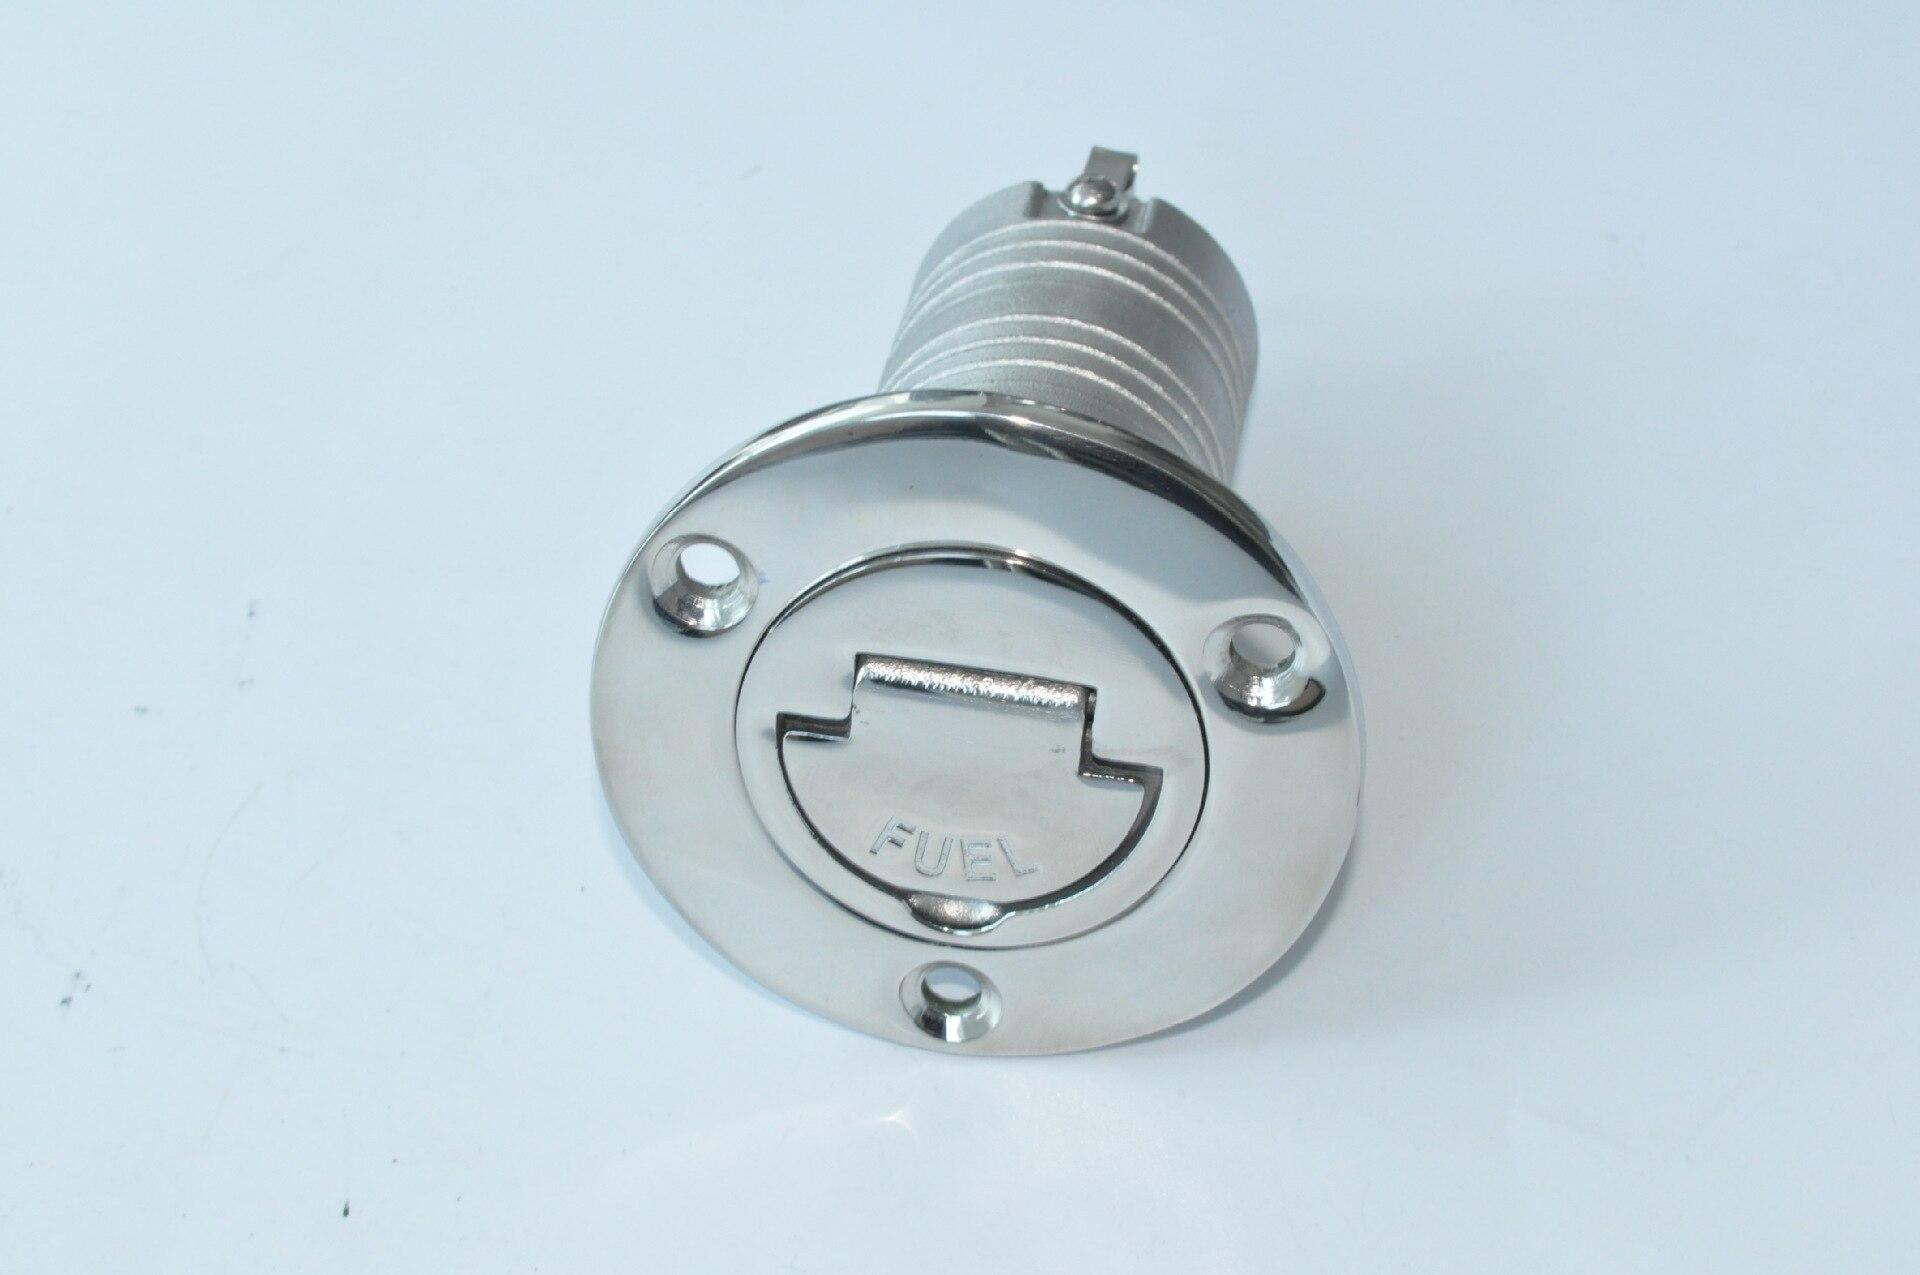 Multi-Model Marine Gas Cover Stainless Steel Filler Opening Wu Shui Kou Marine Hardware Yacht Accessories